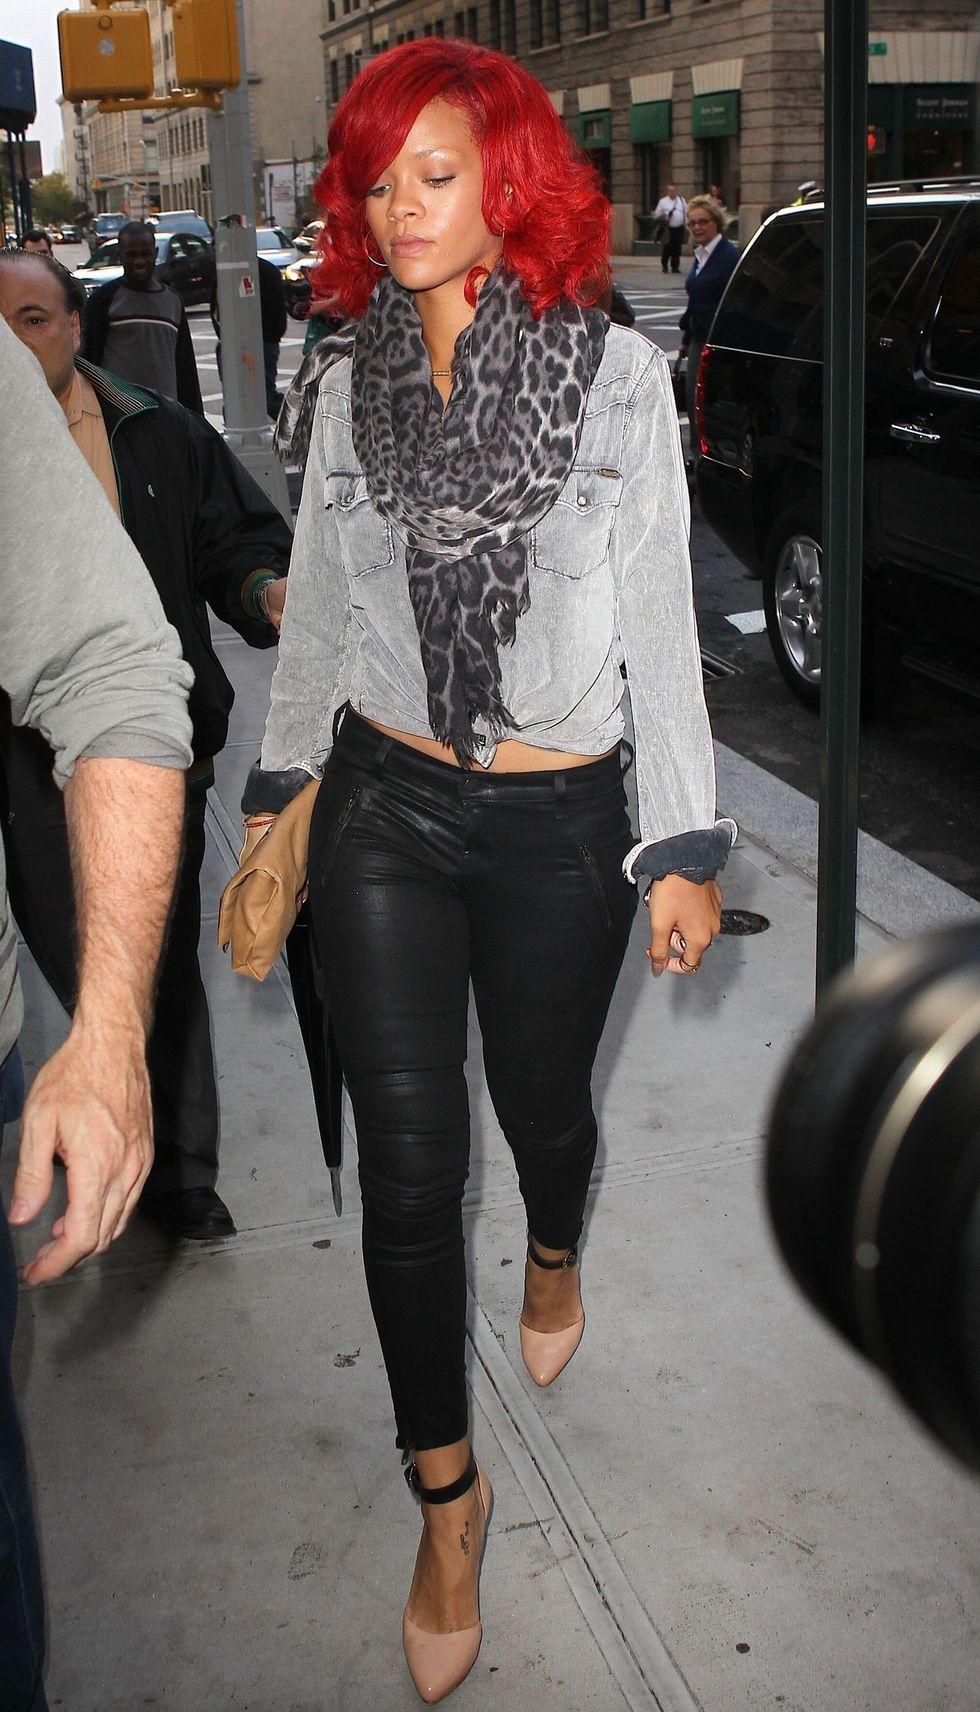 Rihanna Leather Trousers Candids Da Silvano Restaurant In